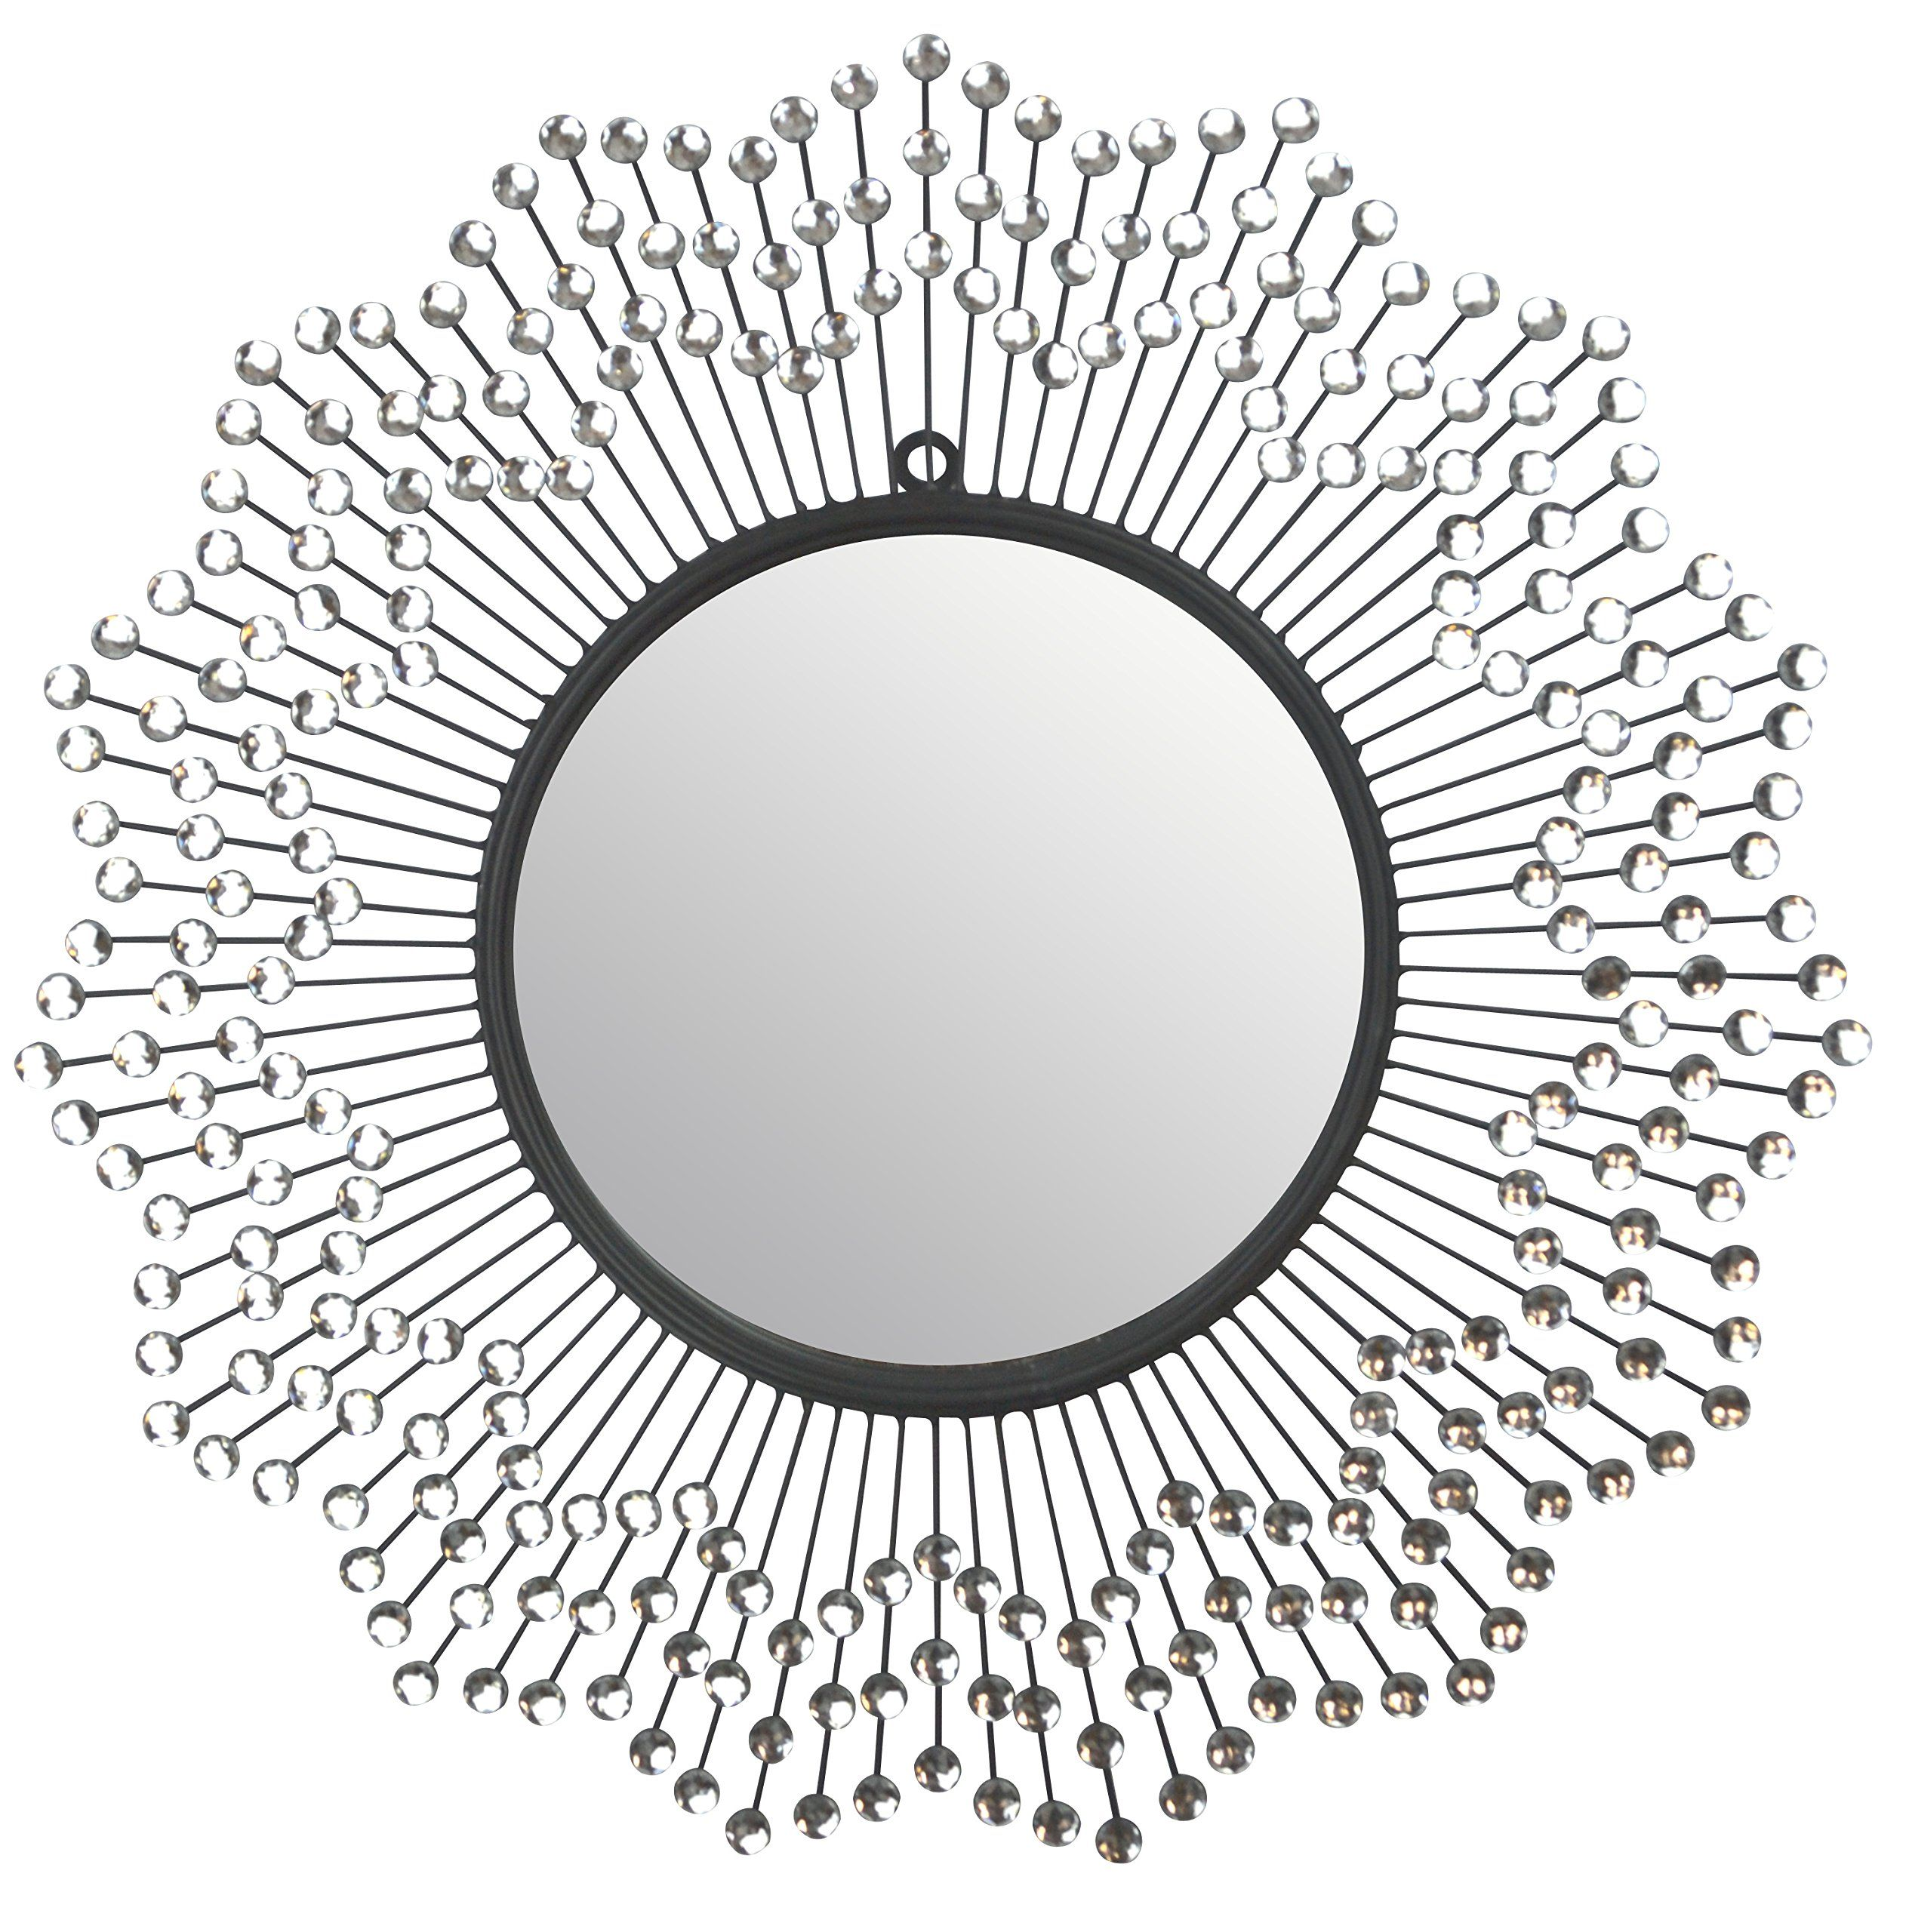 decorative dining traditional large room mirrors createfullcircle com photos l decor for hgtv